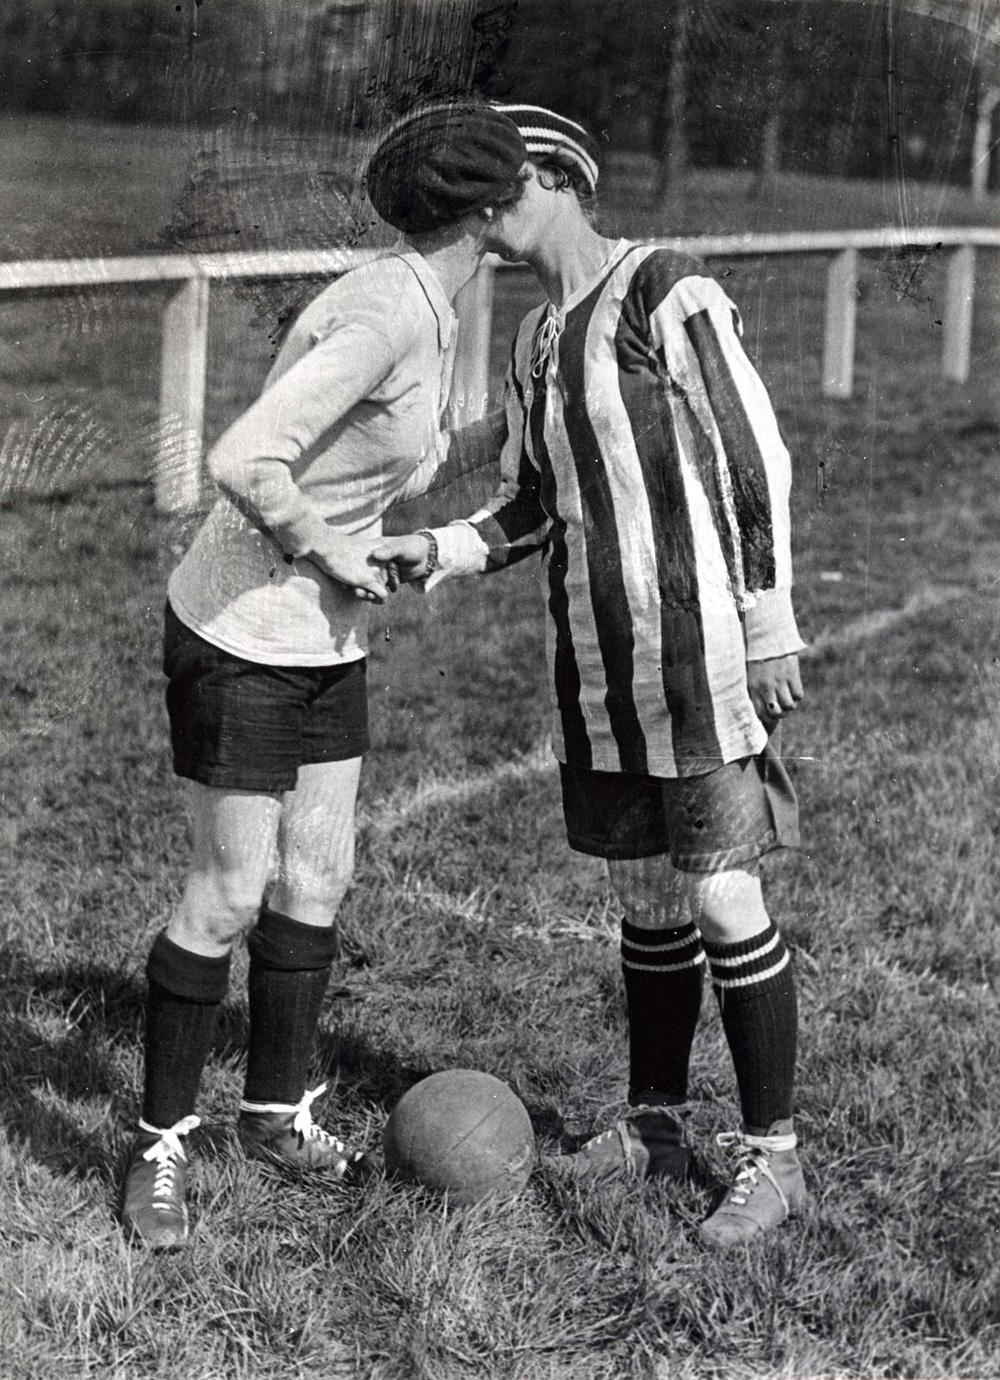 1920, Inghilterra-Francia, il bacio tra le capitane Alice Kell e Madeline Bracquemond